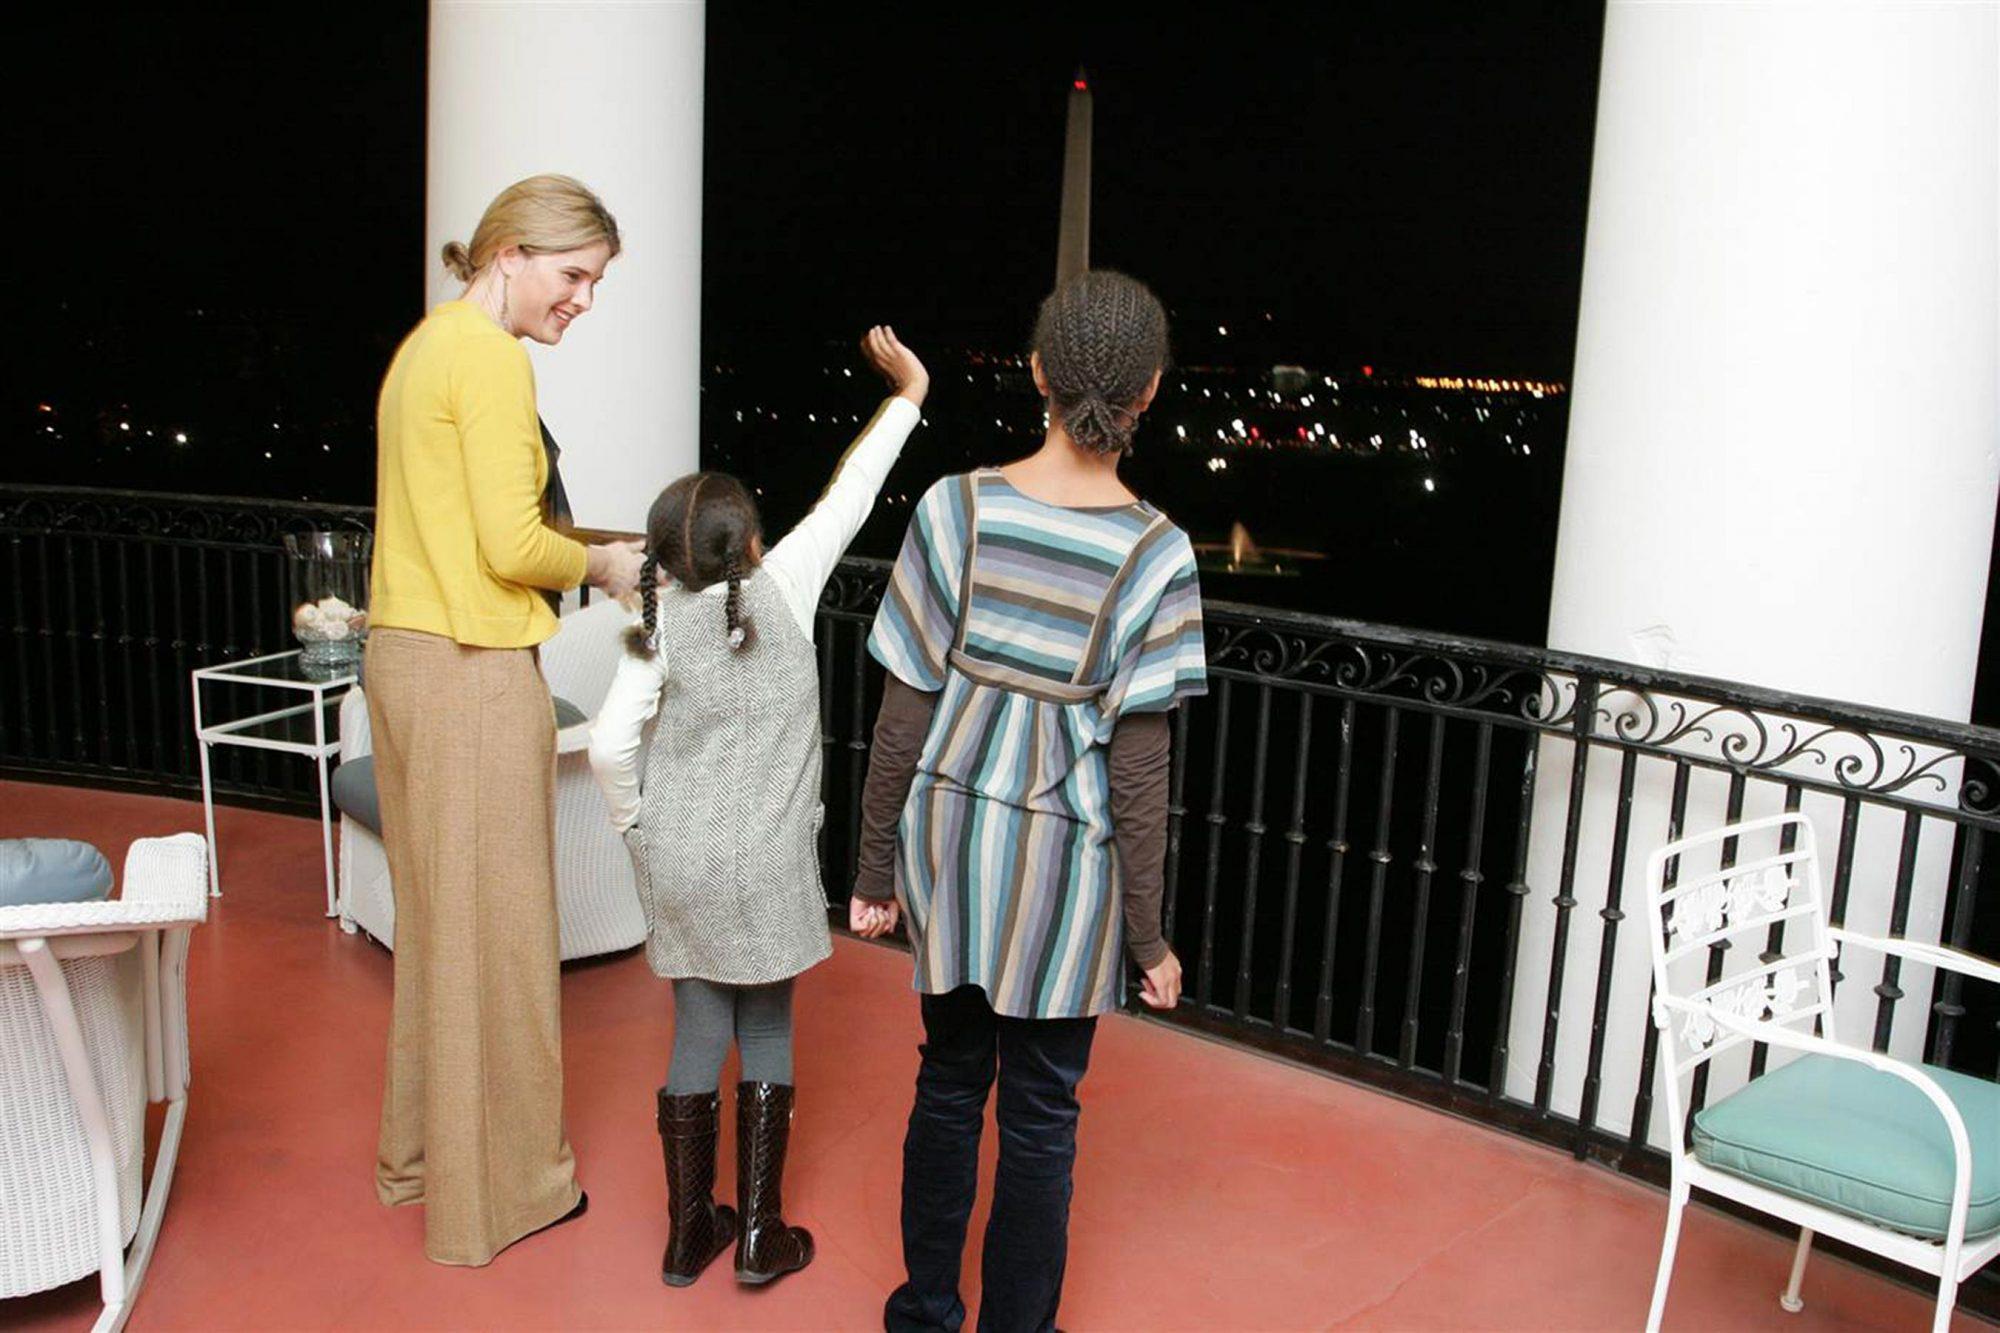 White House Photo CR: Joyce N. Boghosian / White House Photo